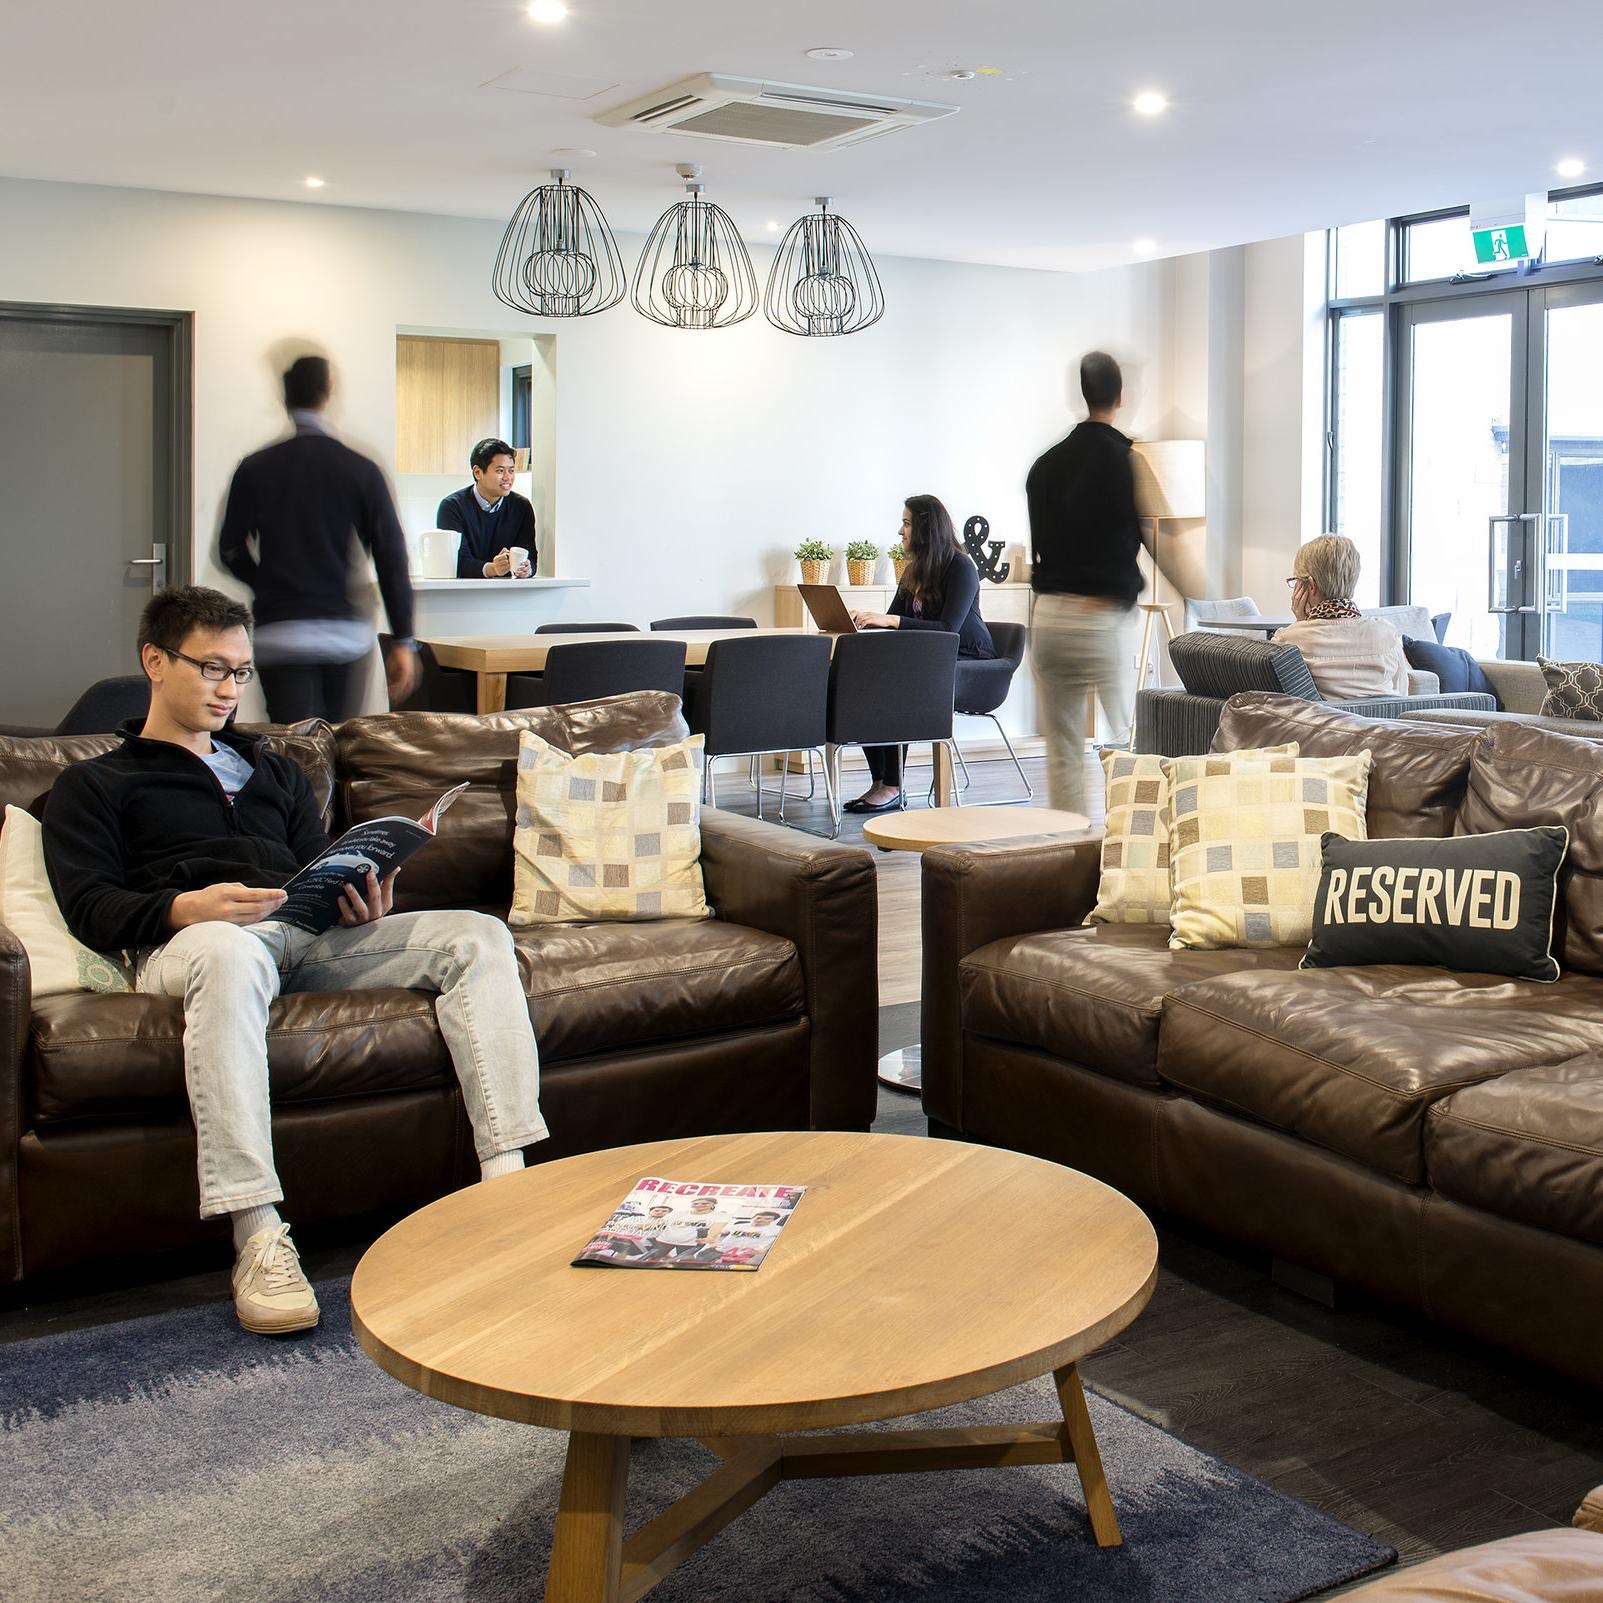 postgraduate study room and common area